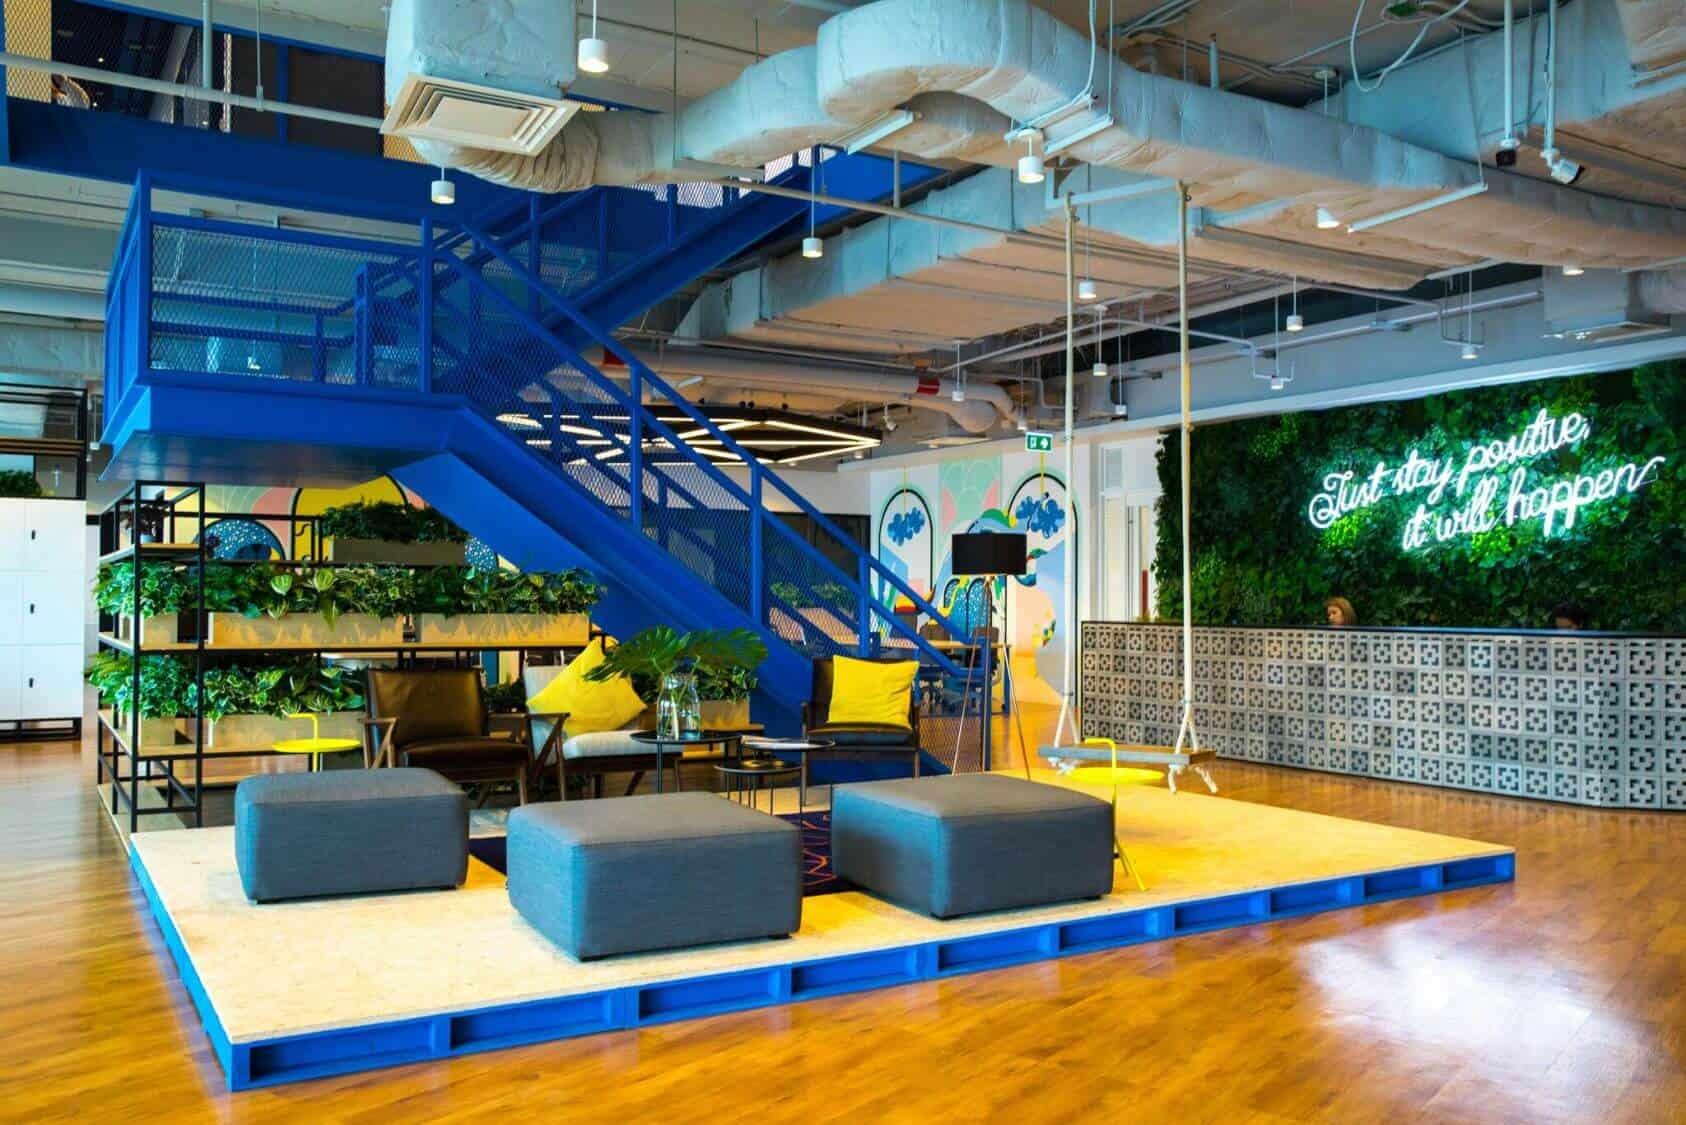 B-Concept Media Entertainment Group office at AIA Sathorn Tower, 11/1 South Sathorn Road, Yannawa, Bangkok, TH 10120. bconceptgroup.com